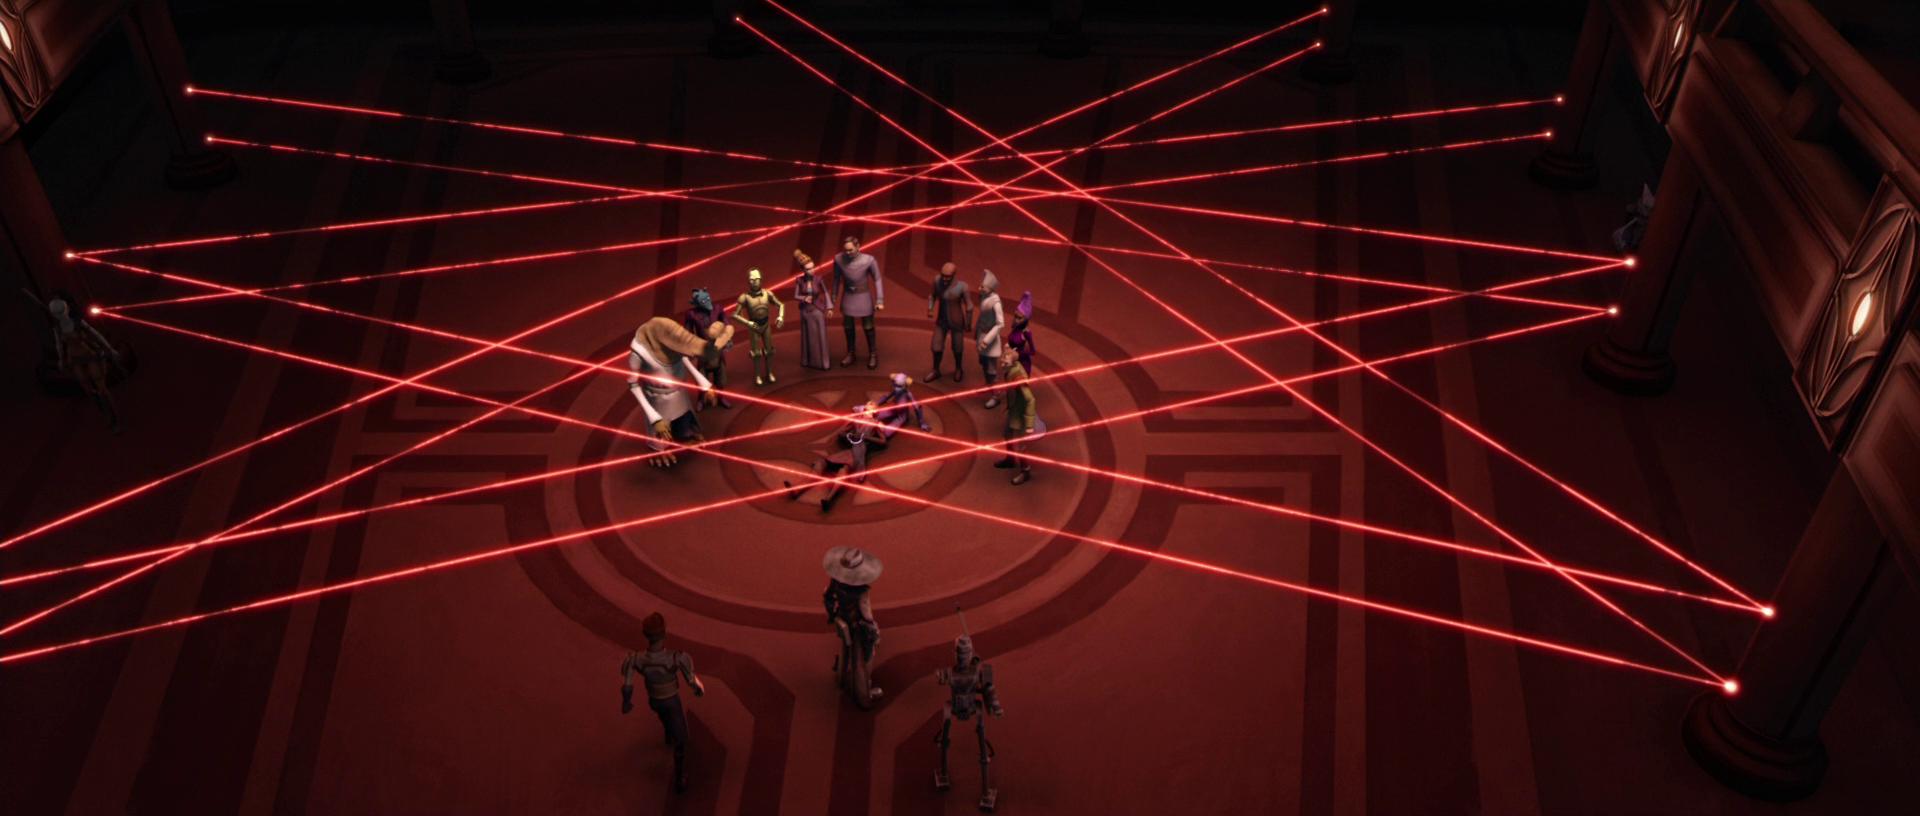 Laser web   Wookieepedia   FANDOM powered by Wikia